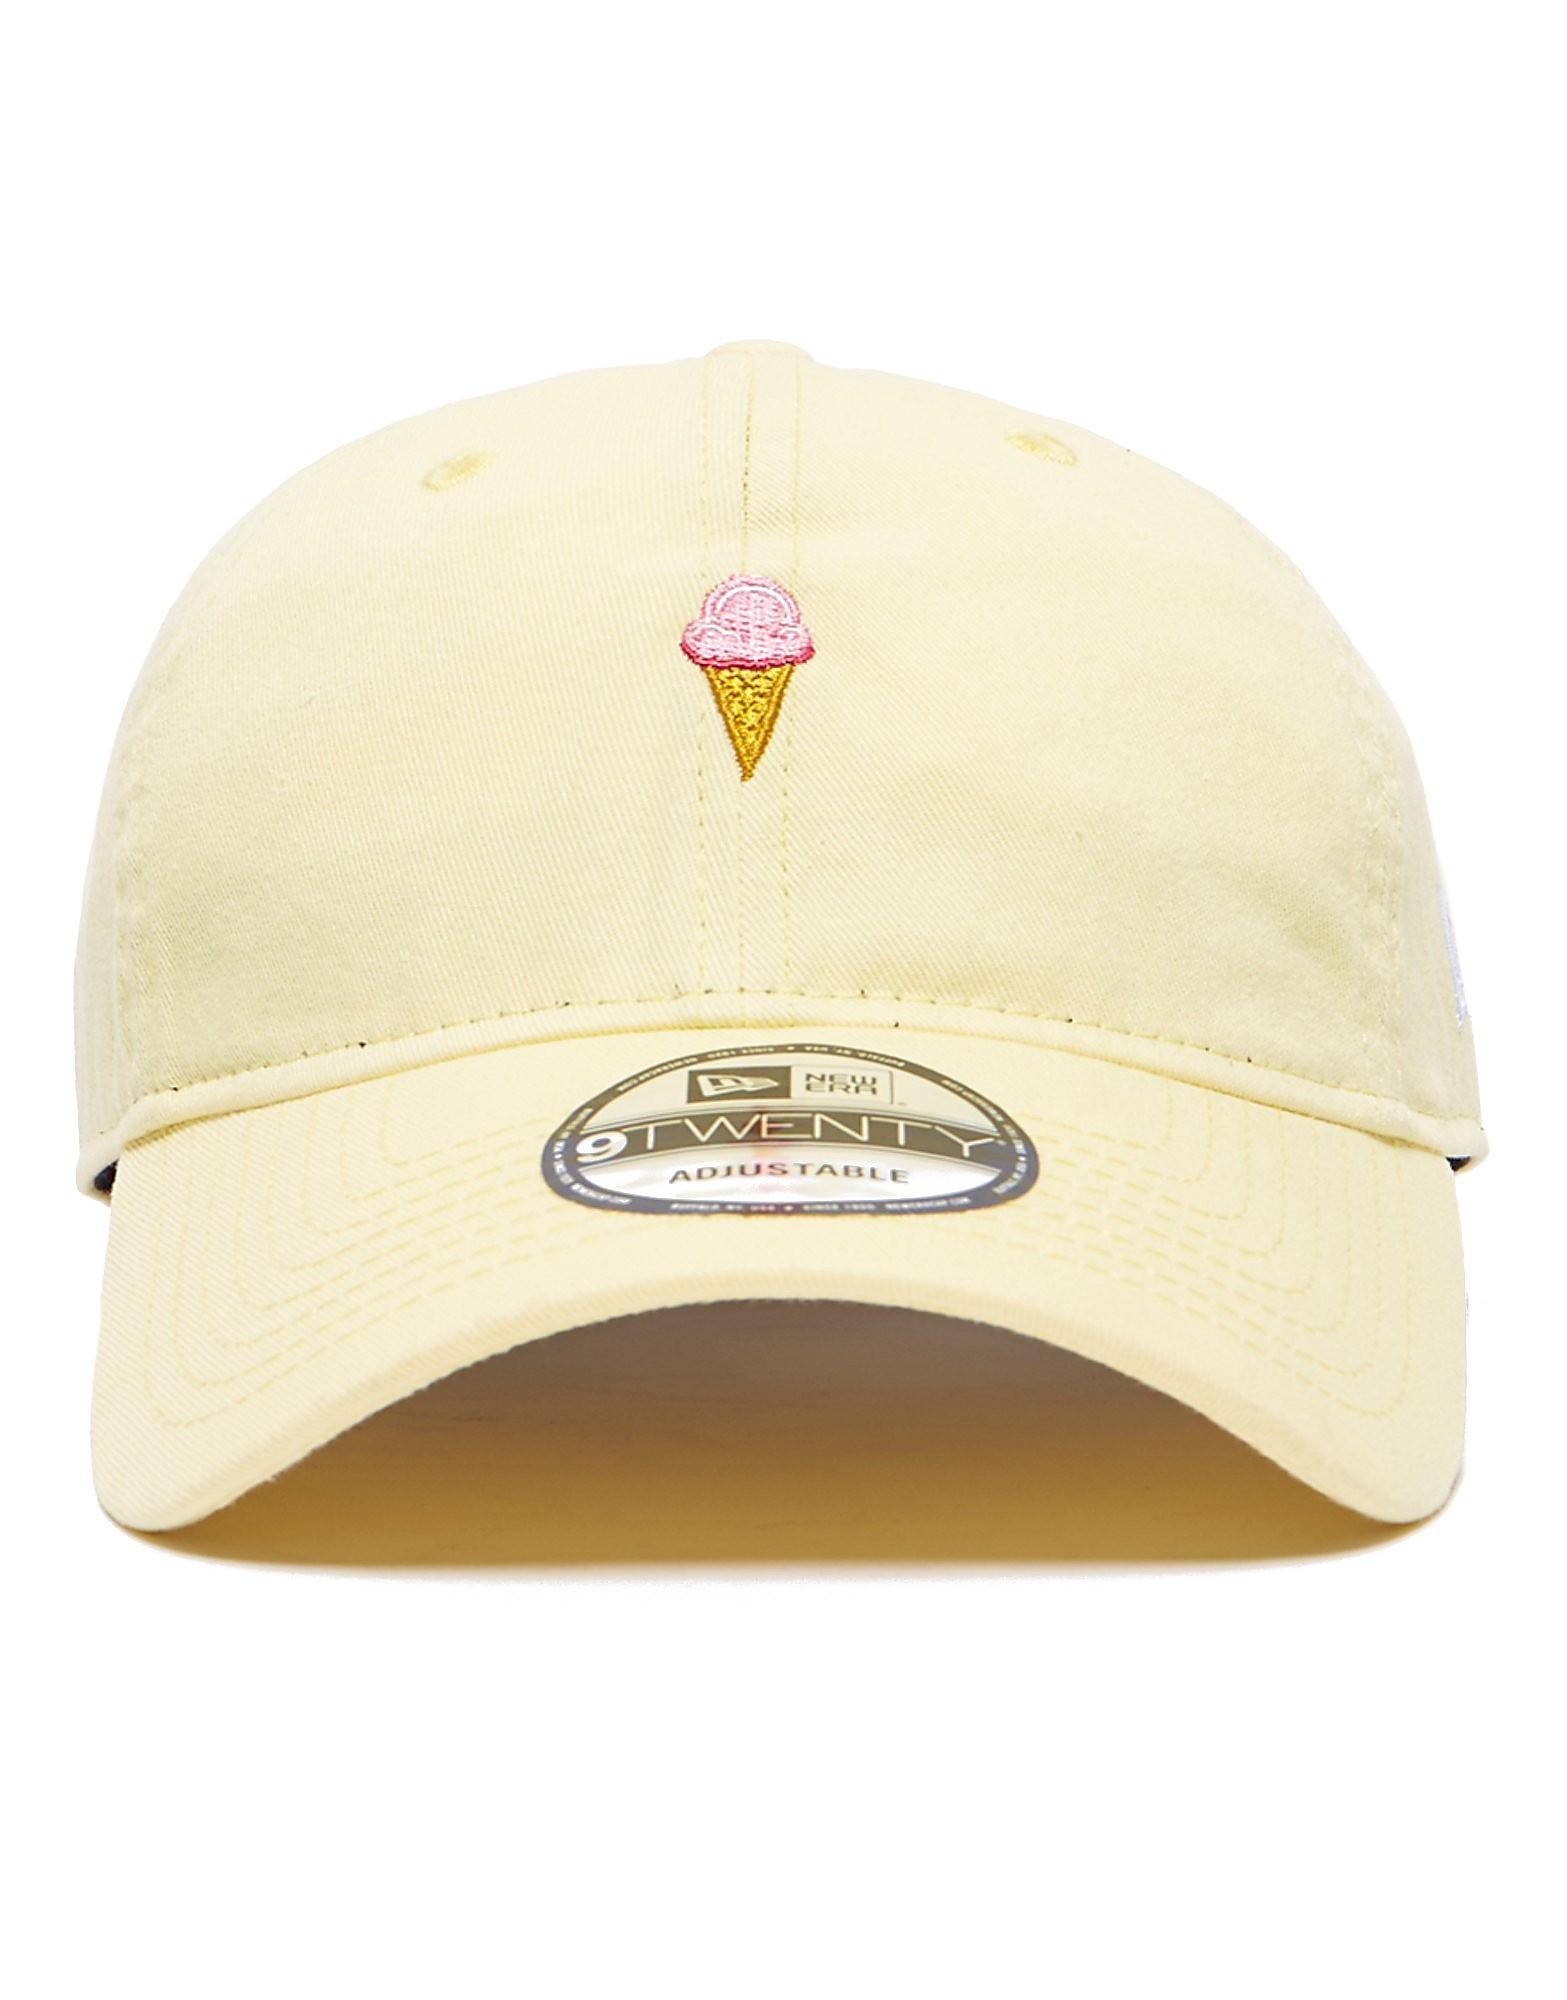 New Era 9TWENTY Ice Cream Cap